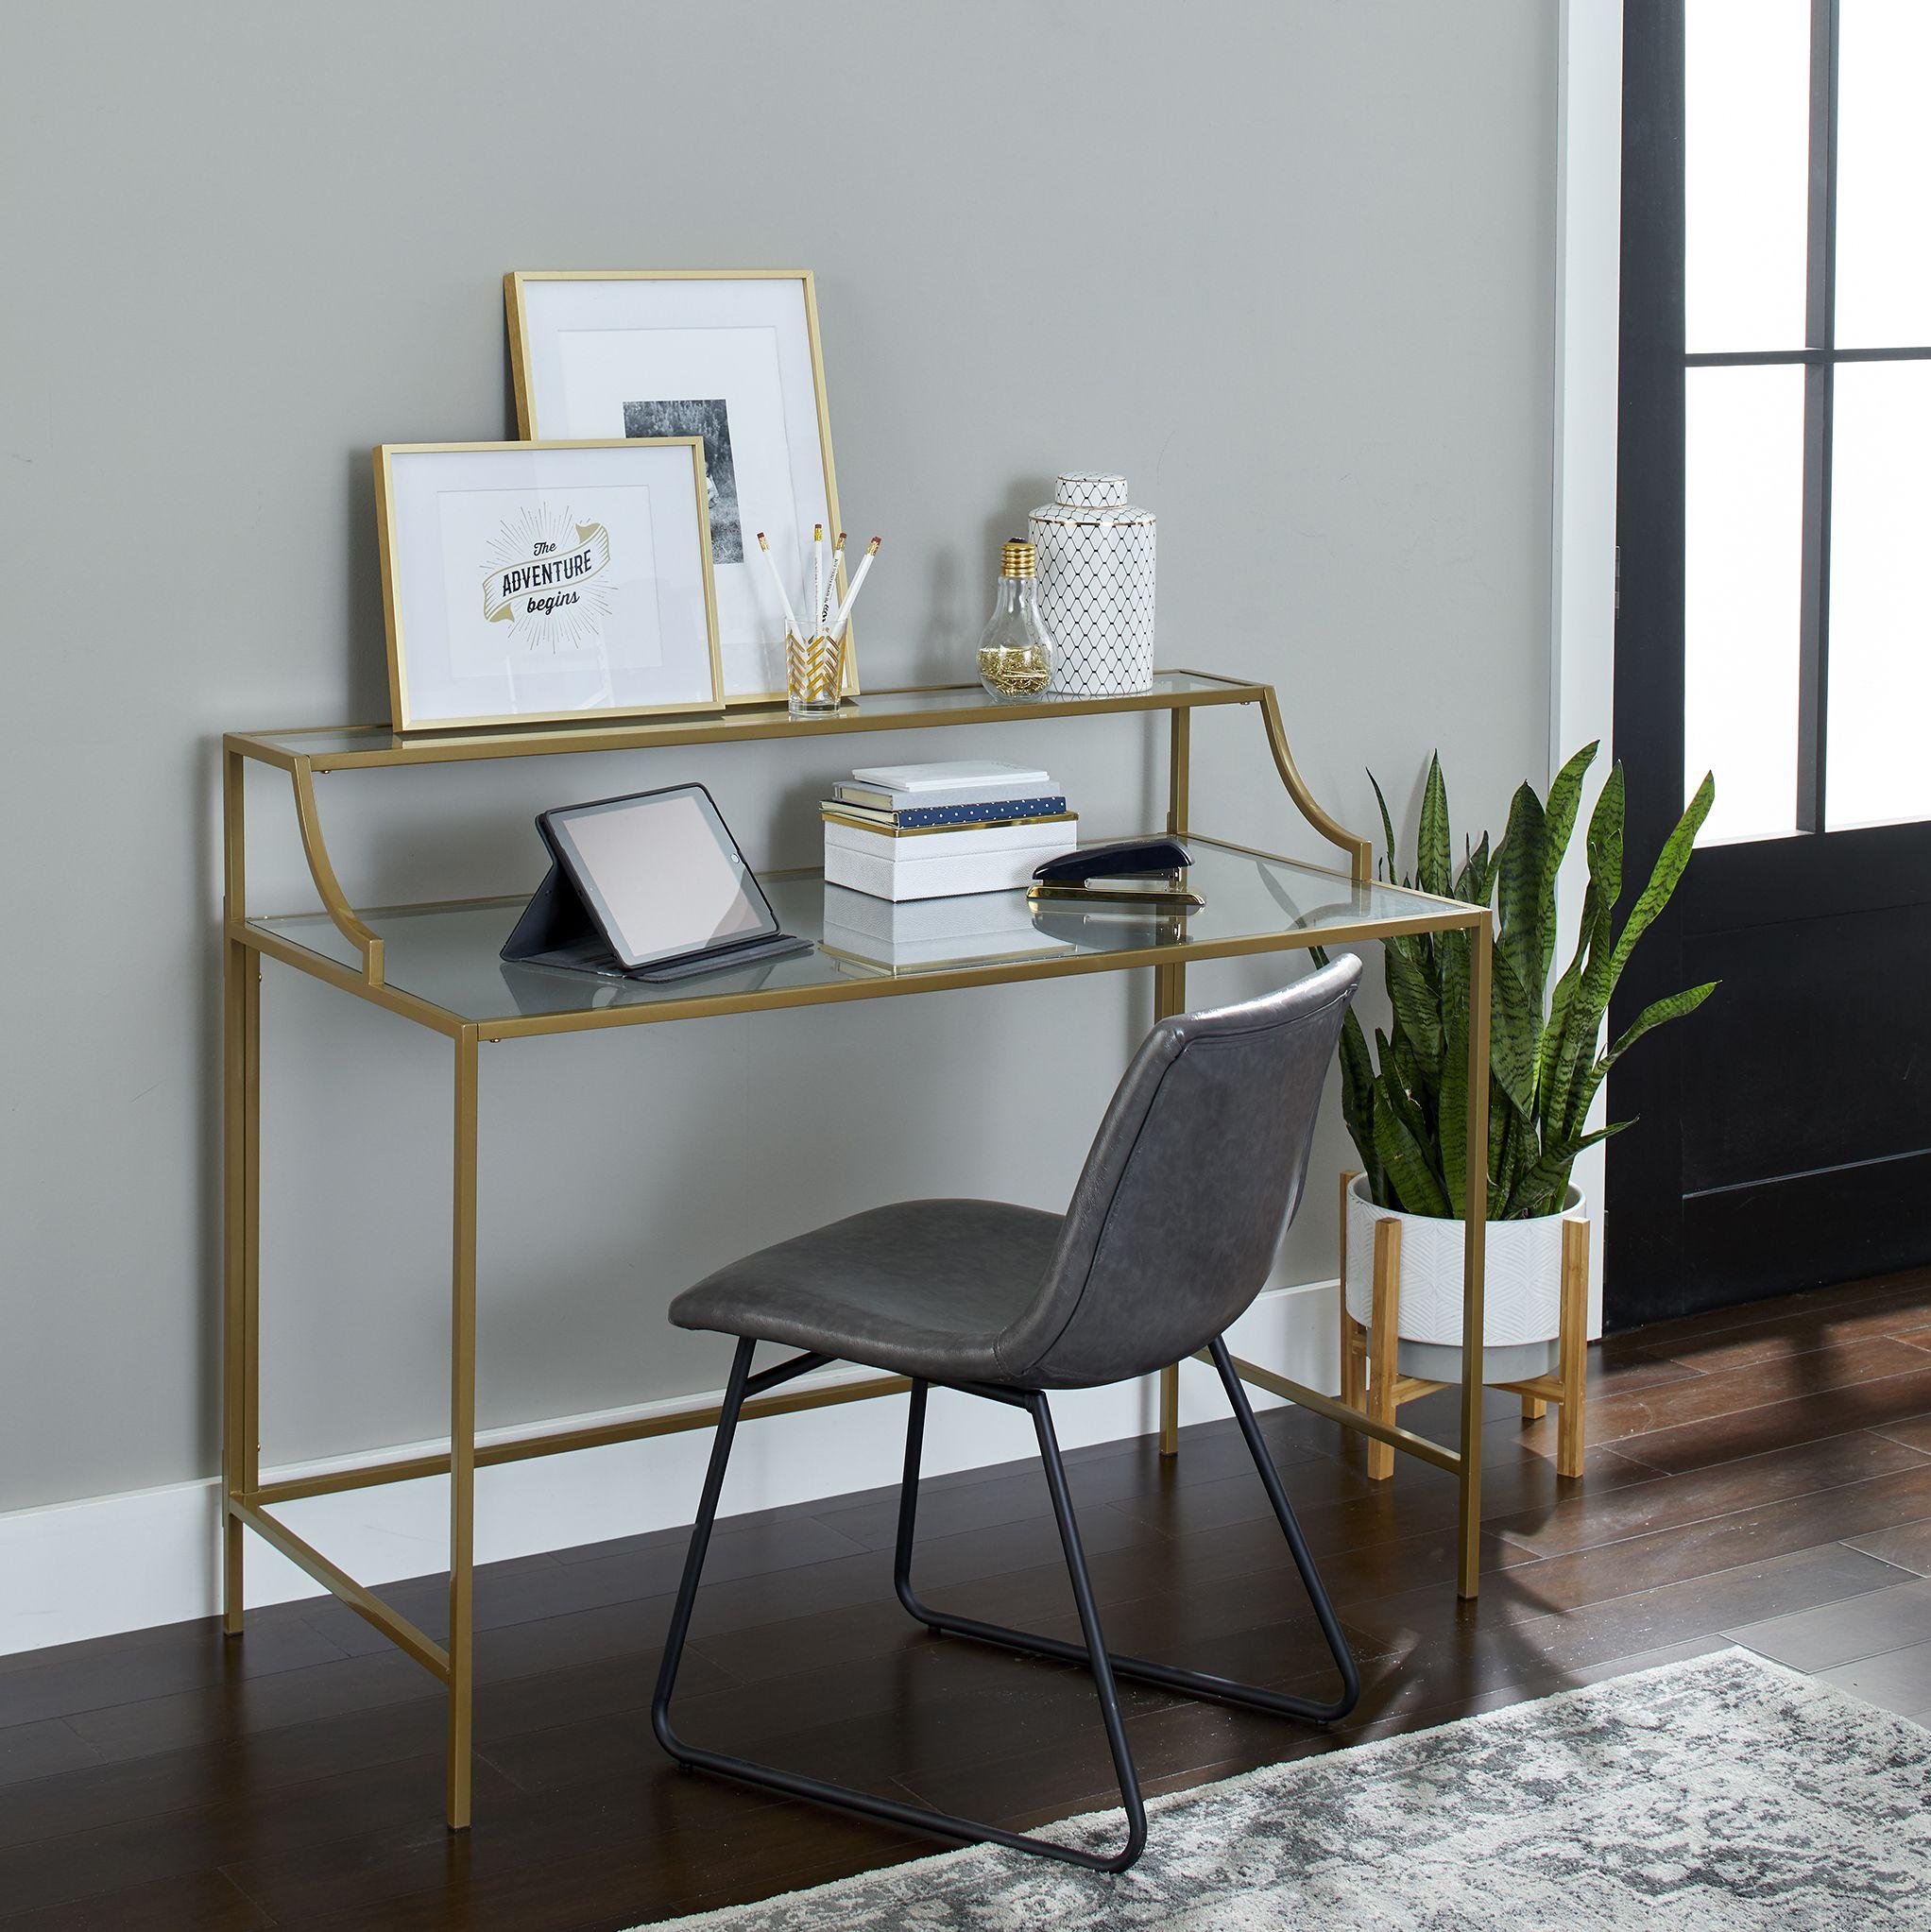 Better Homes Gardens Nola Writing Desk Gold Finish Walmart Com In 2020 Home Decor Vases Home Decor Decor